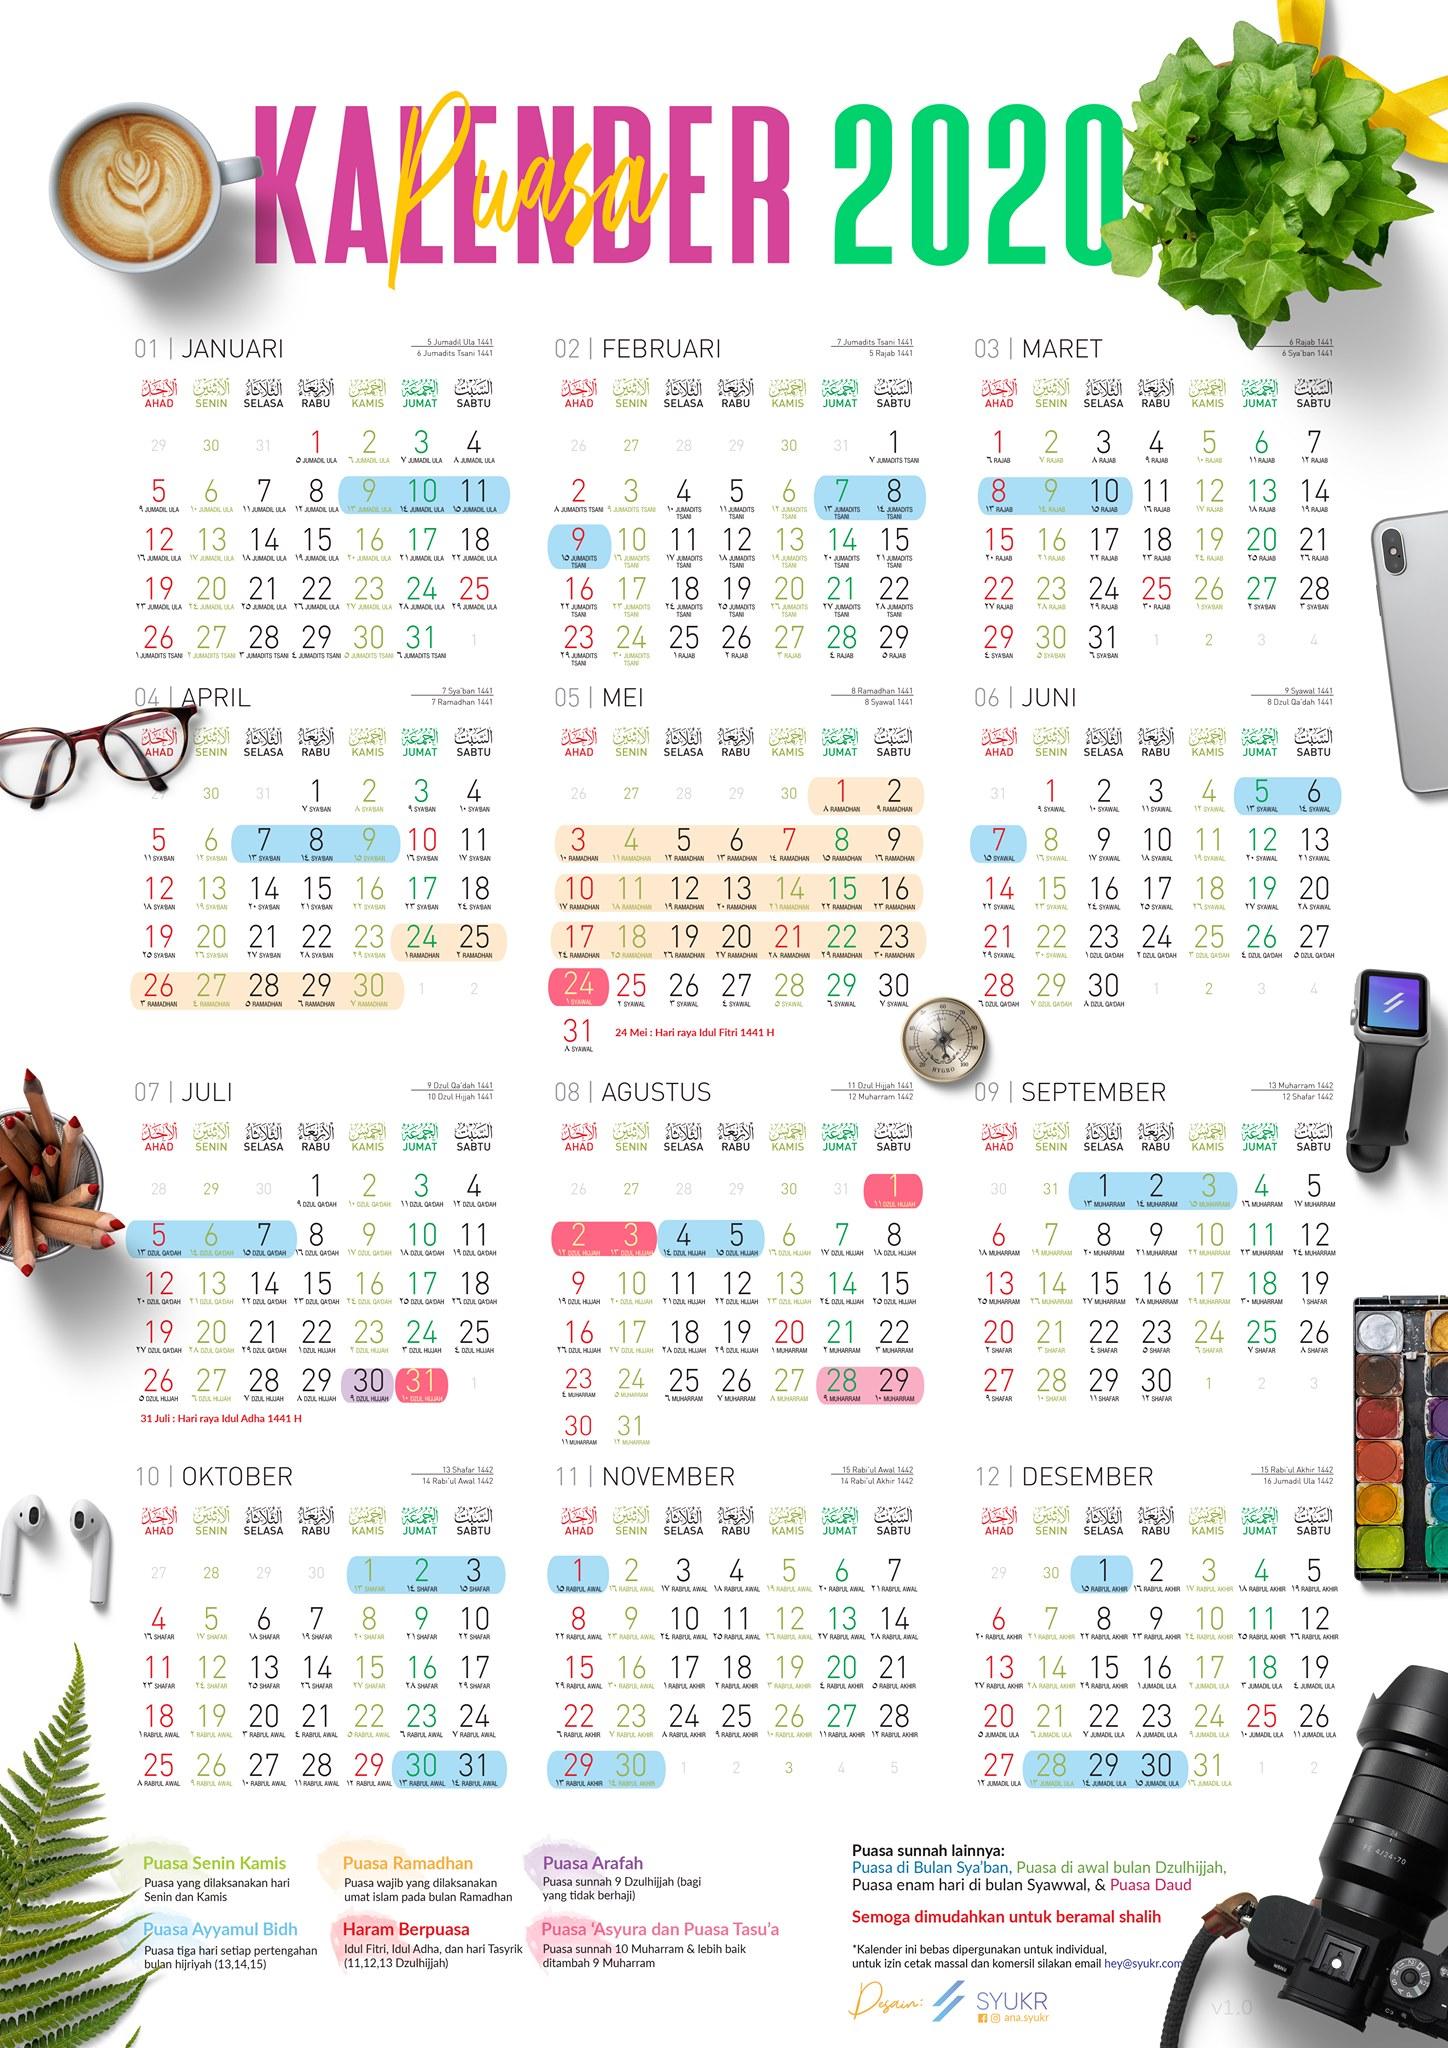 Puasa Ayyamul Bidh Juli 2020 : puasa, ayyamul, Puasa, Sunnah, Ayyamul, Bulan, Jumadil, 1441H, Keutamaan, Ramadhan, Assunahsalafushshalih